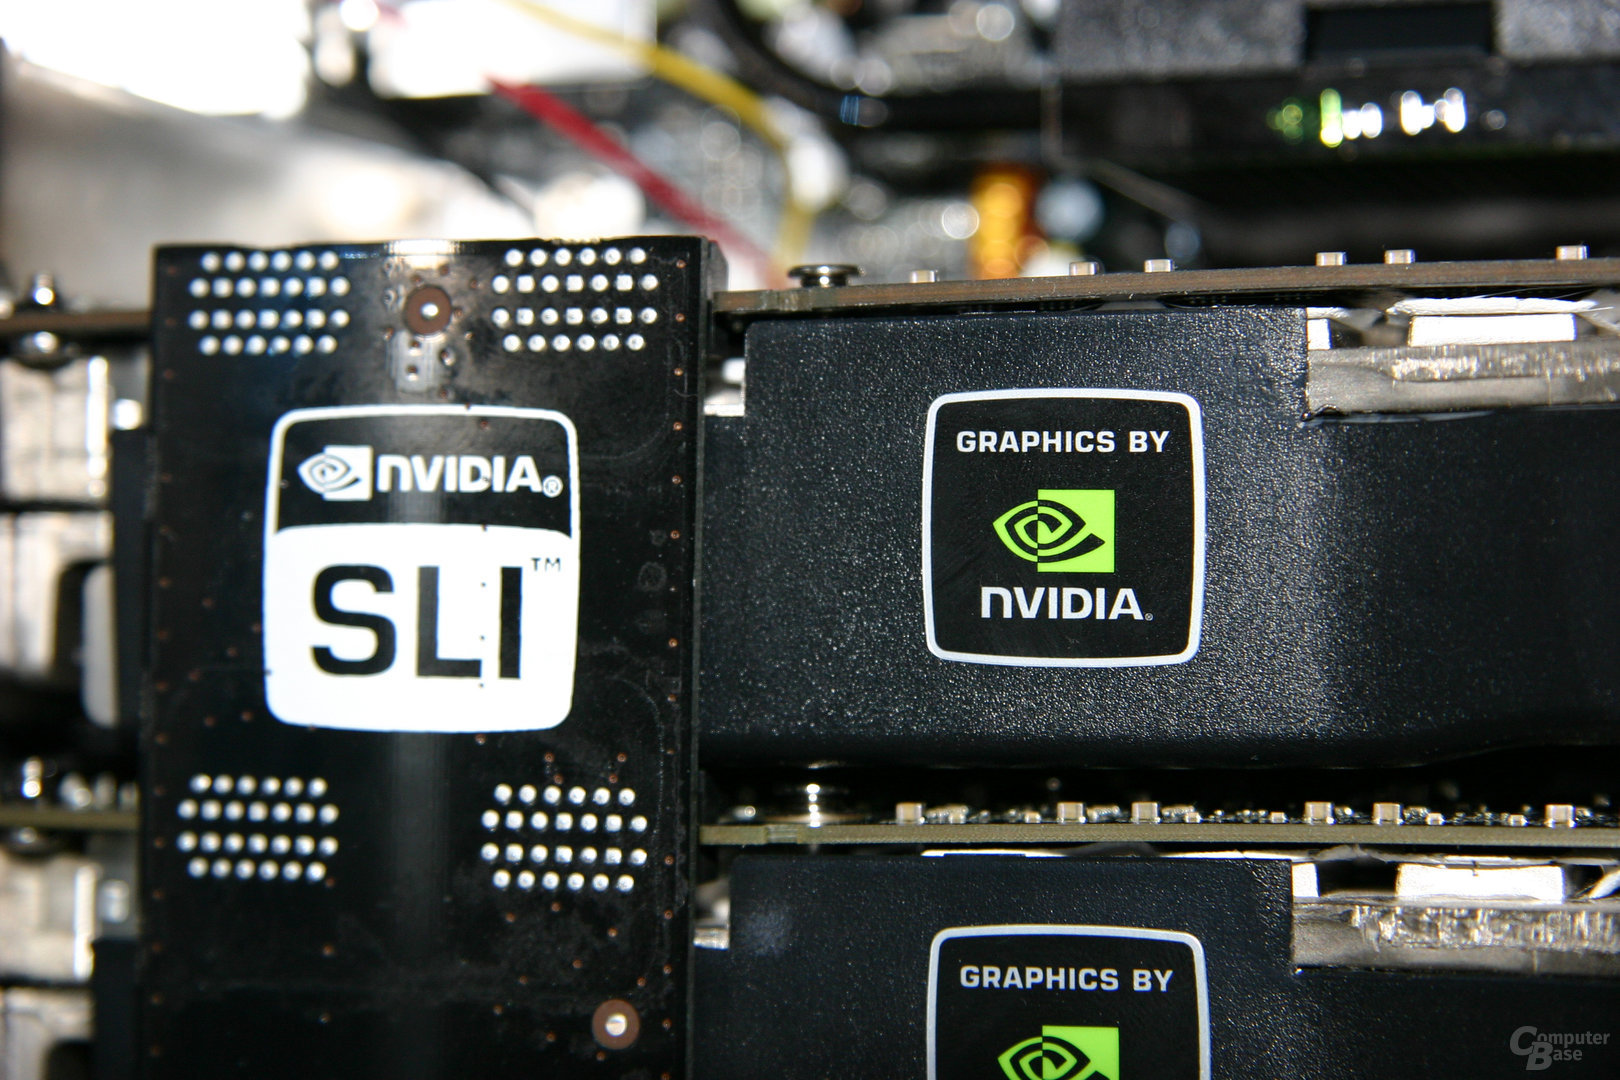 Powered by Nvidia